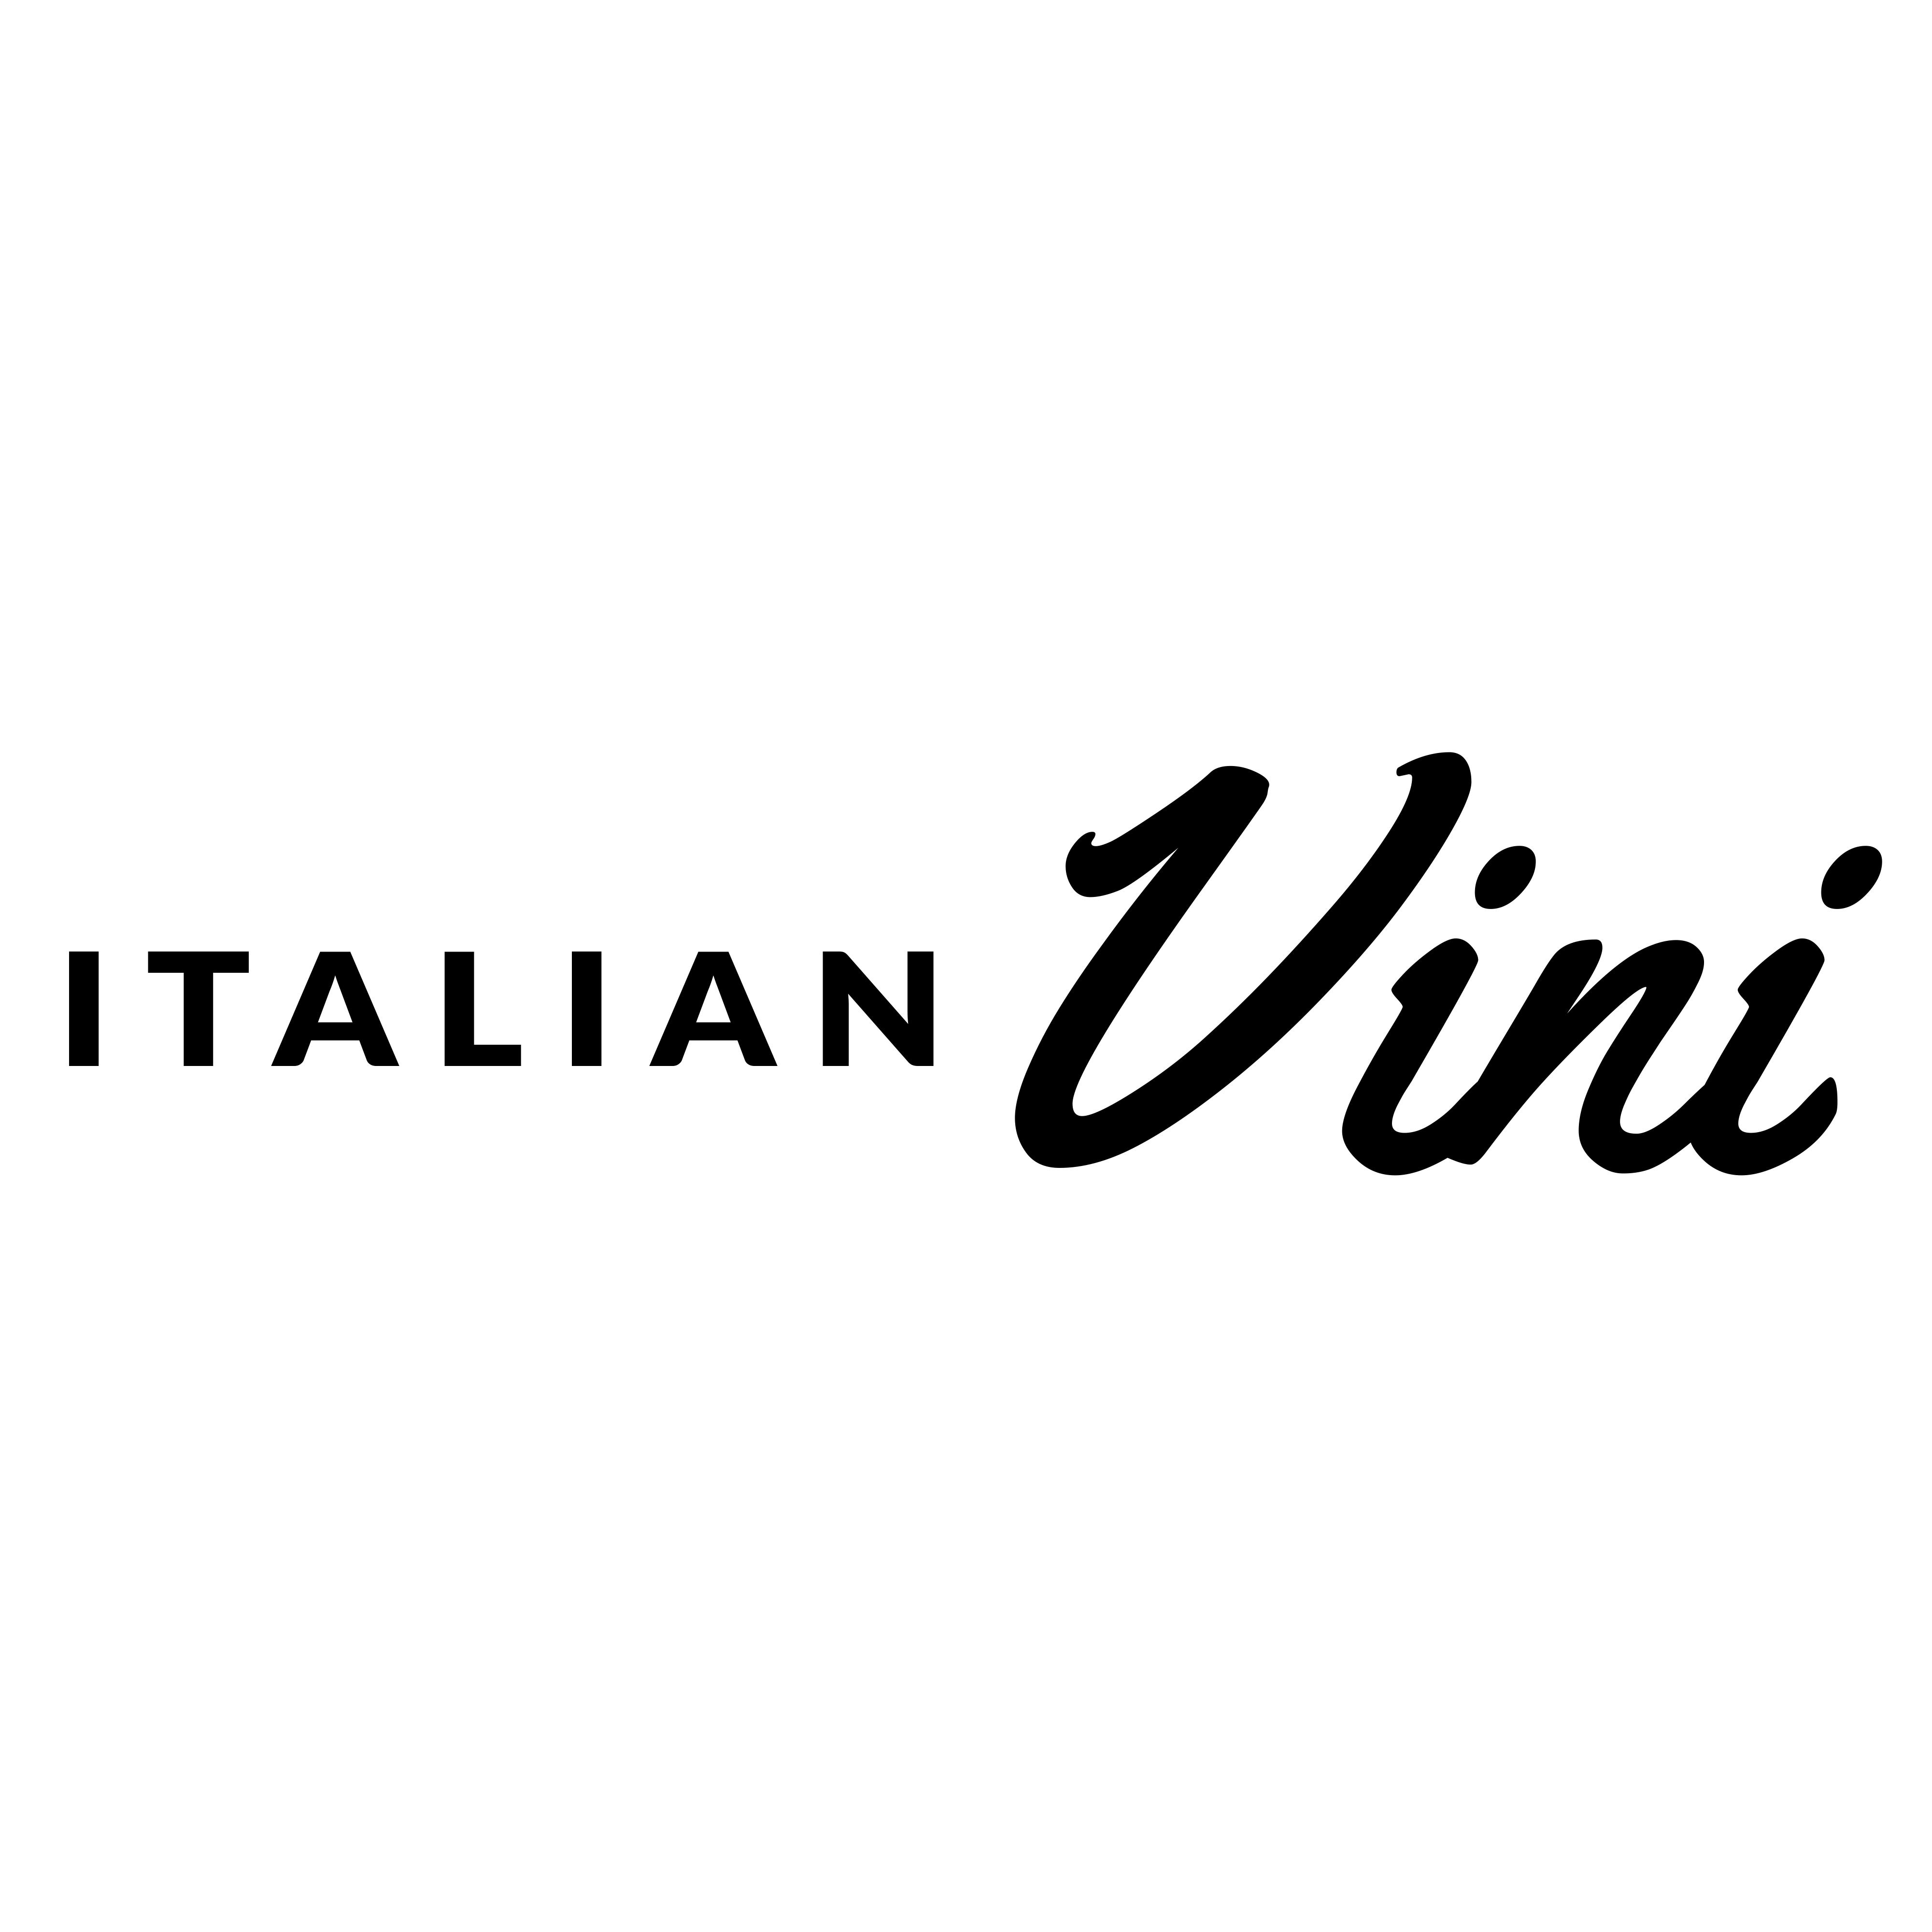 Italian Vini